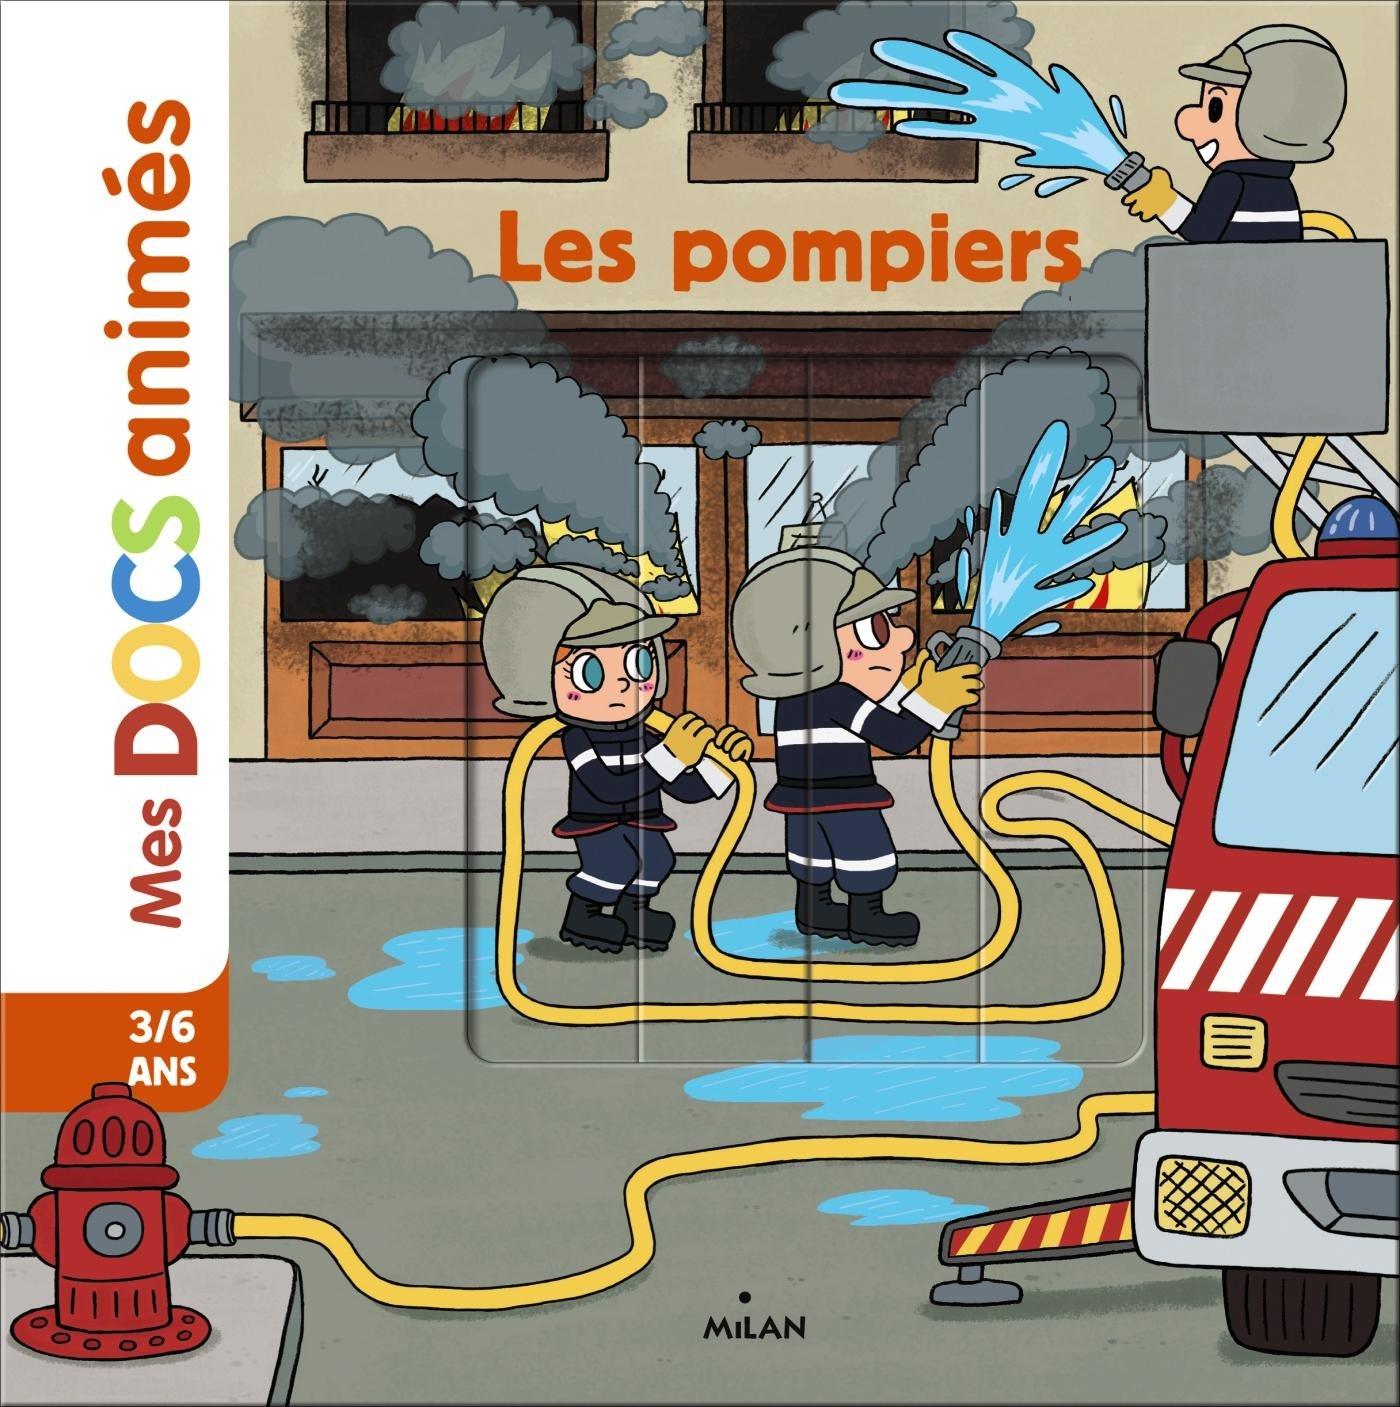 Les pompiers Album – 5 octobre 2016 Stéphane Frattini Stéphanie Ledu Didchocolatine Editions Milan